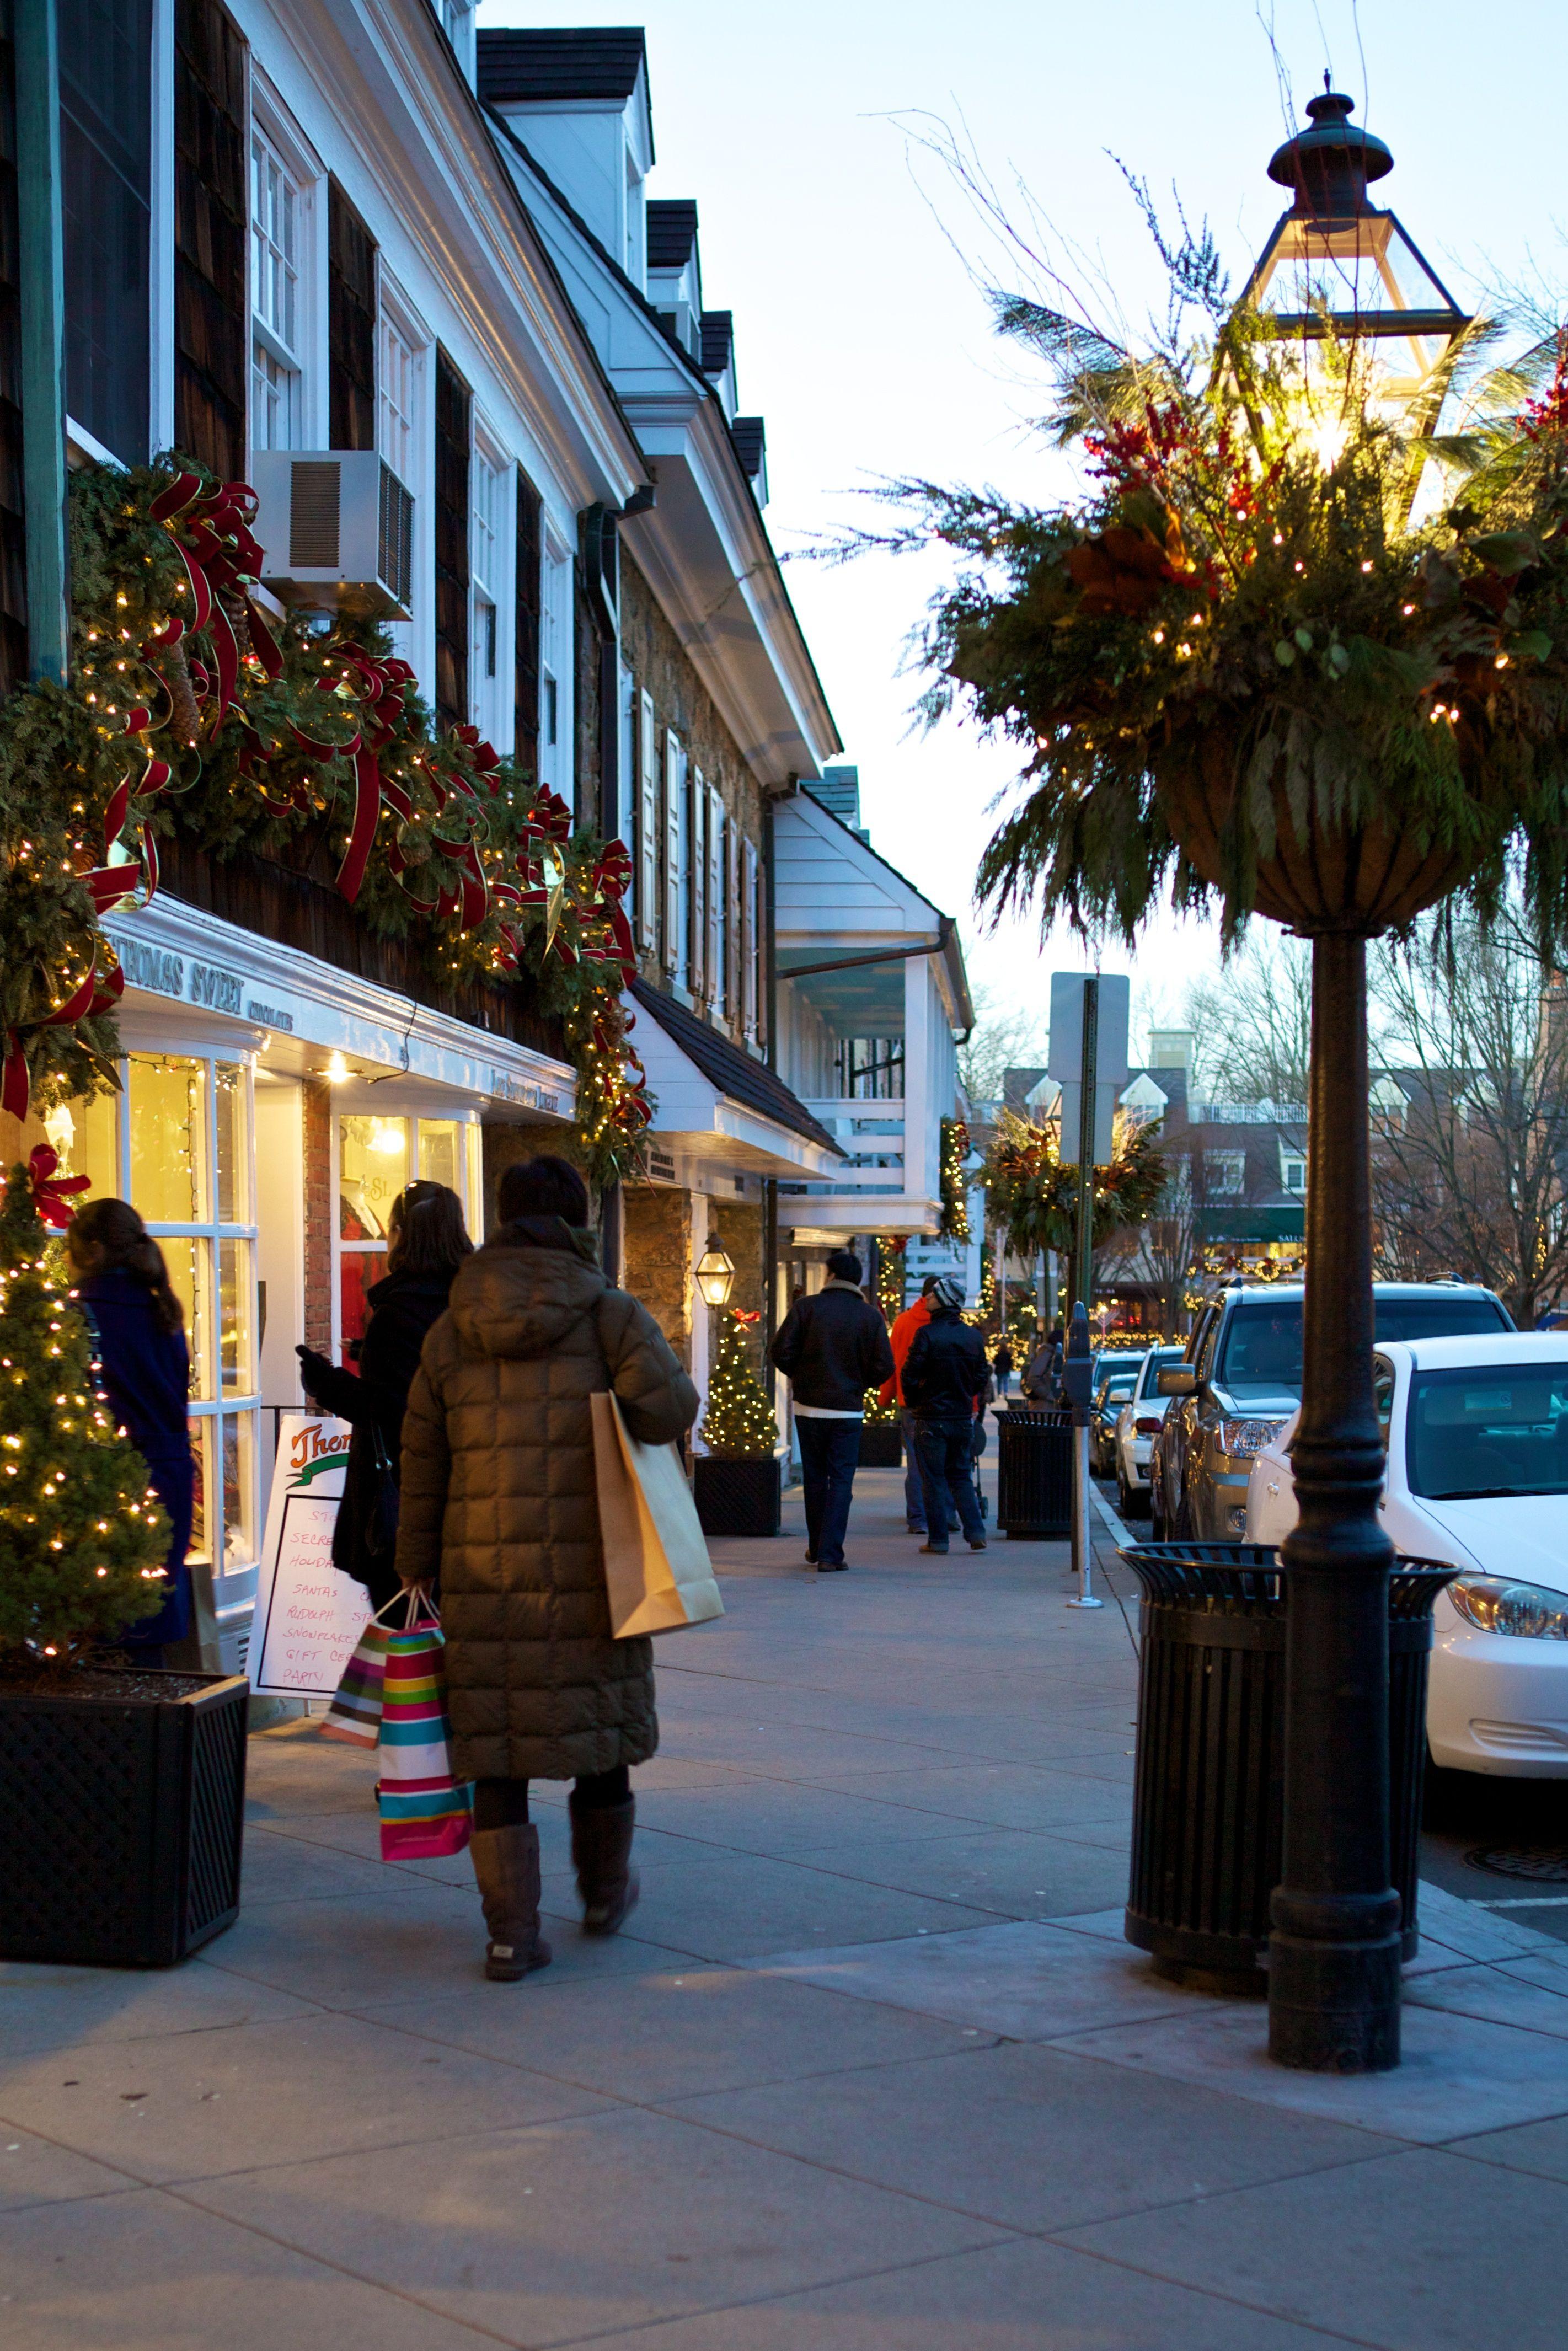 Holiday S At Palmer Square Princeton Village Nj